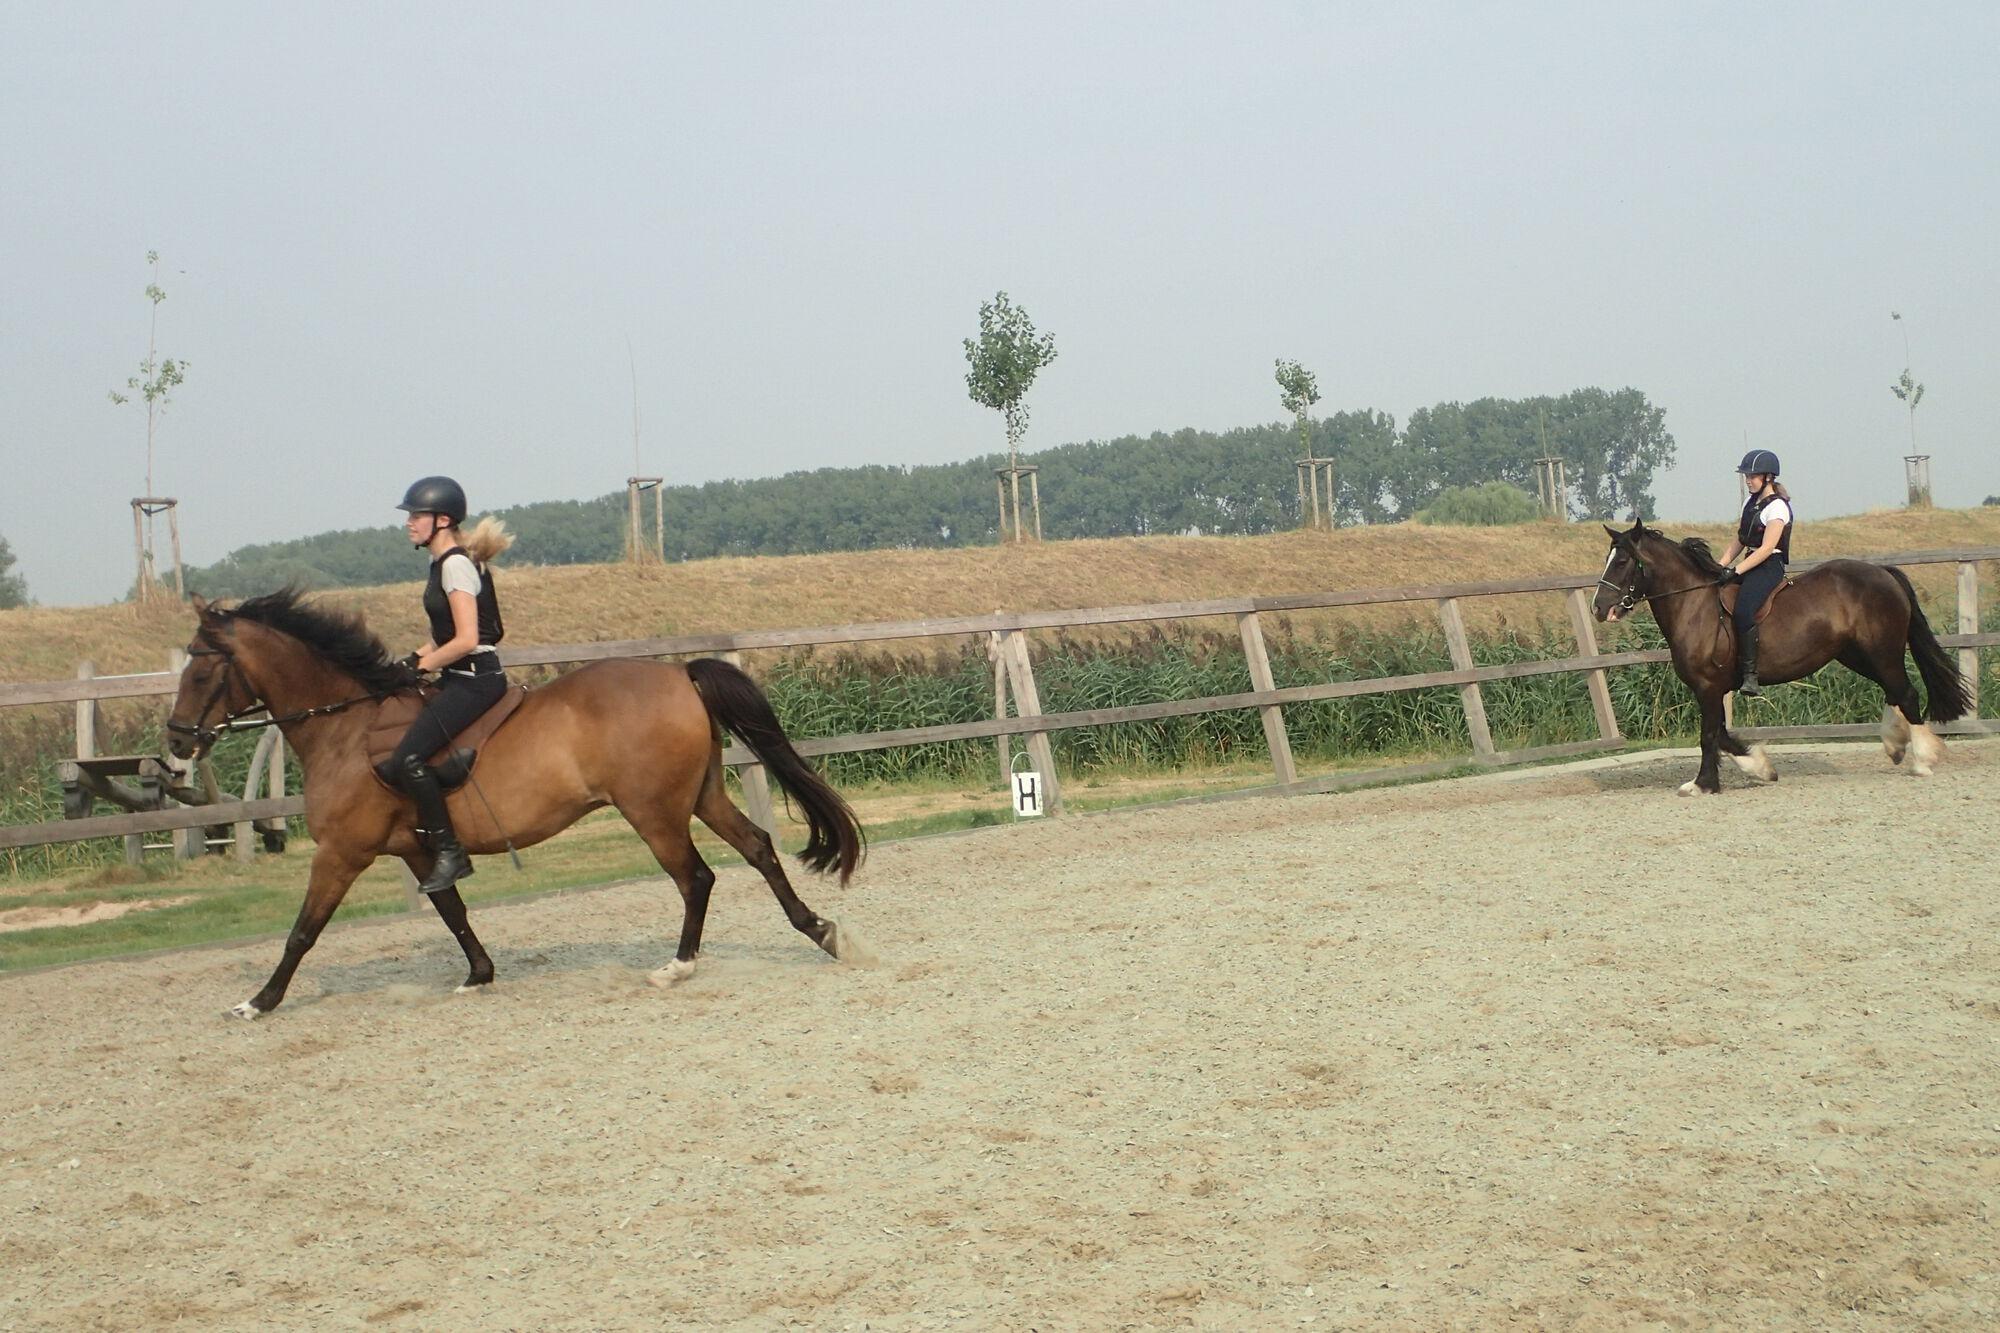 200810 - Sportkamp Zomer Week 33 - Rode Bubbel